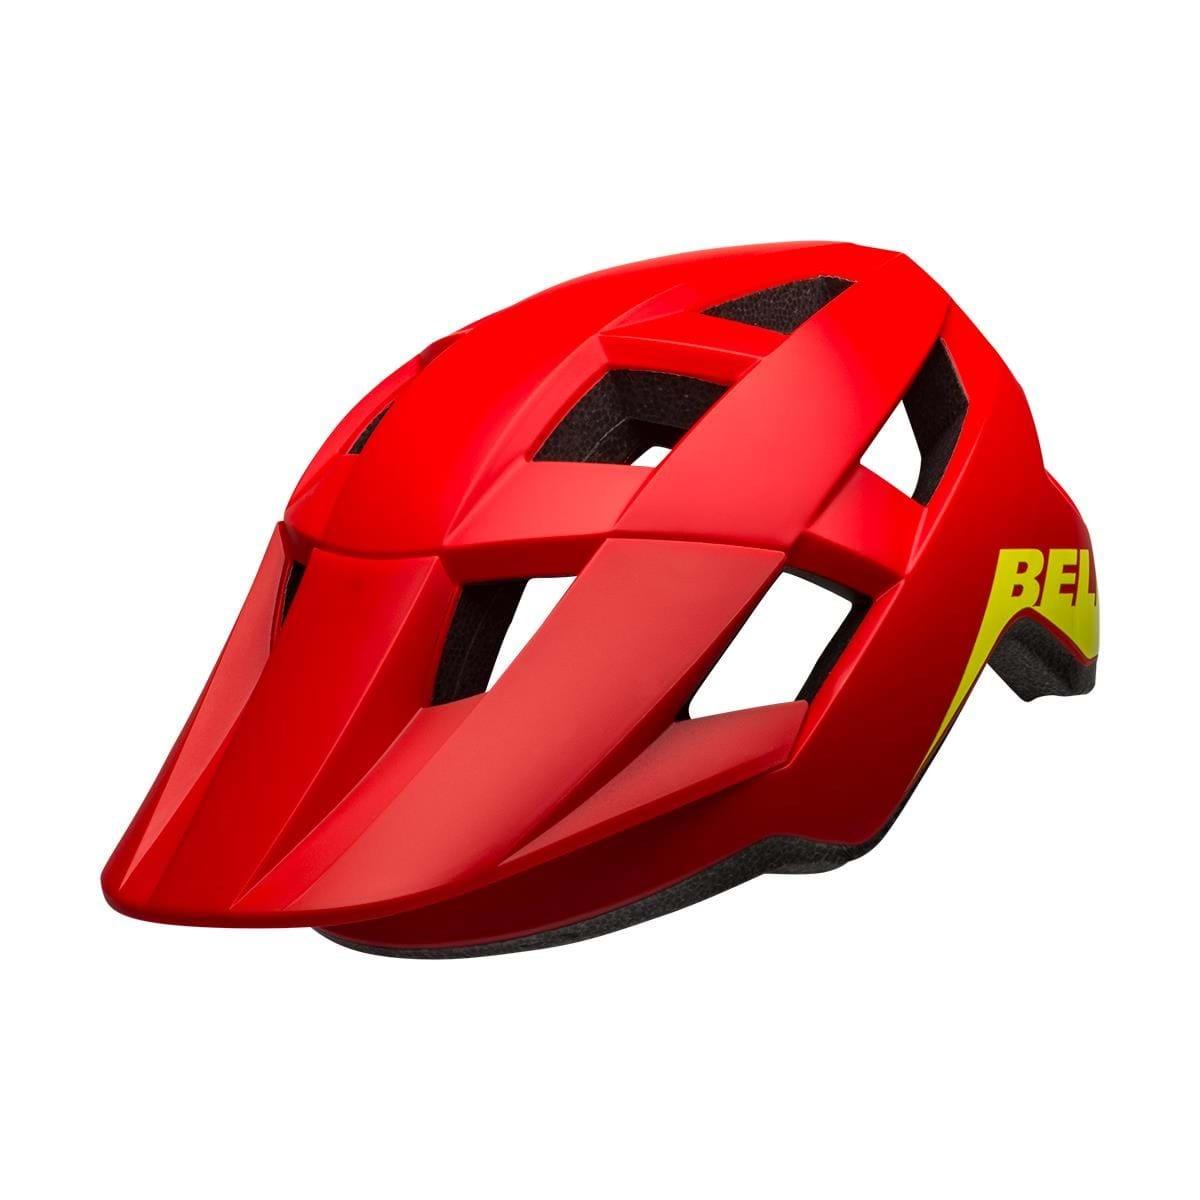 Spark Junior Youth Helmet